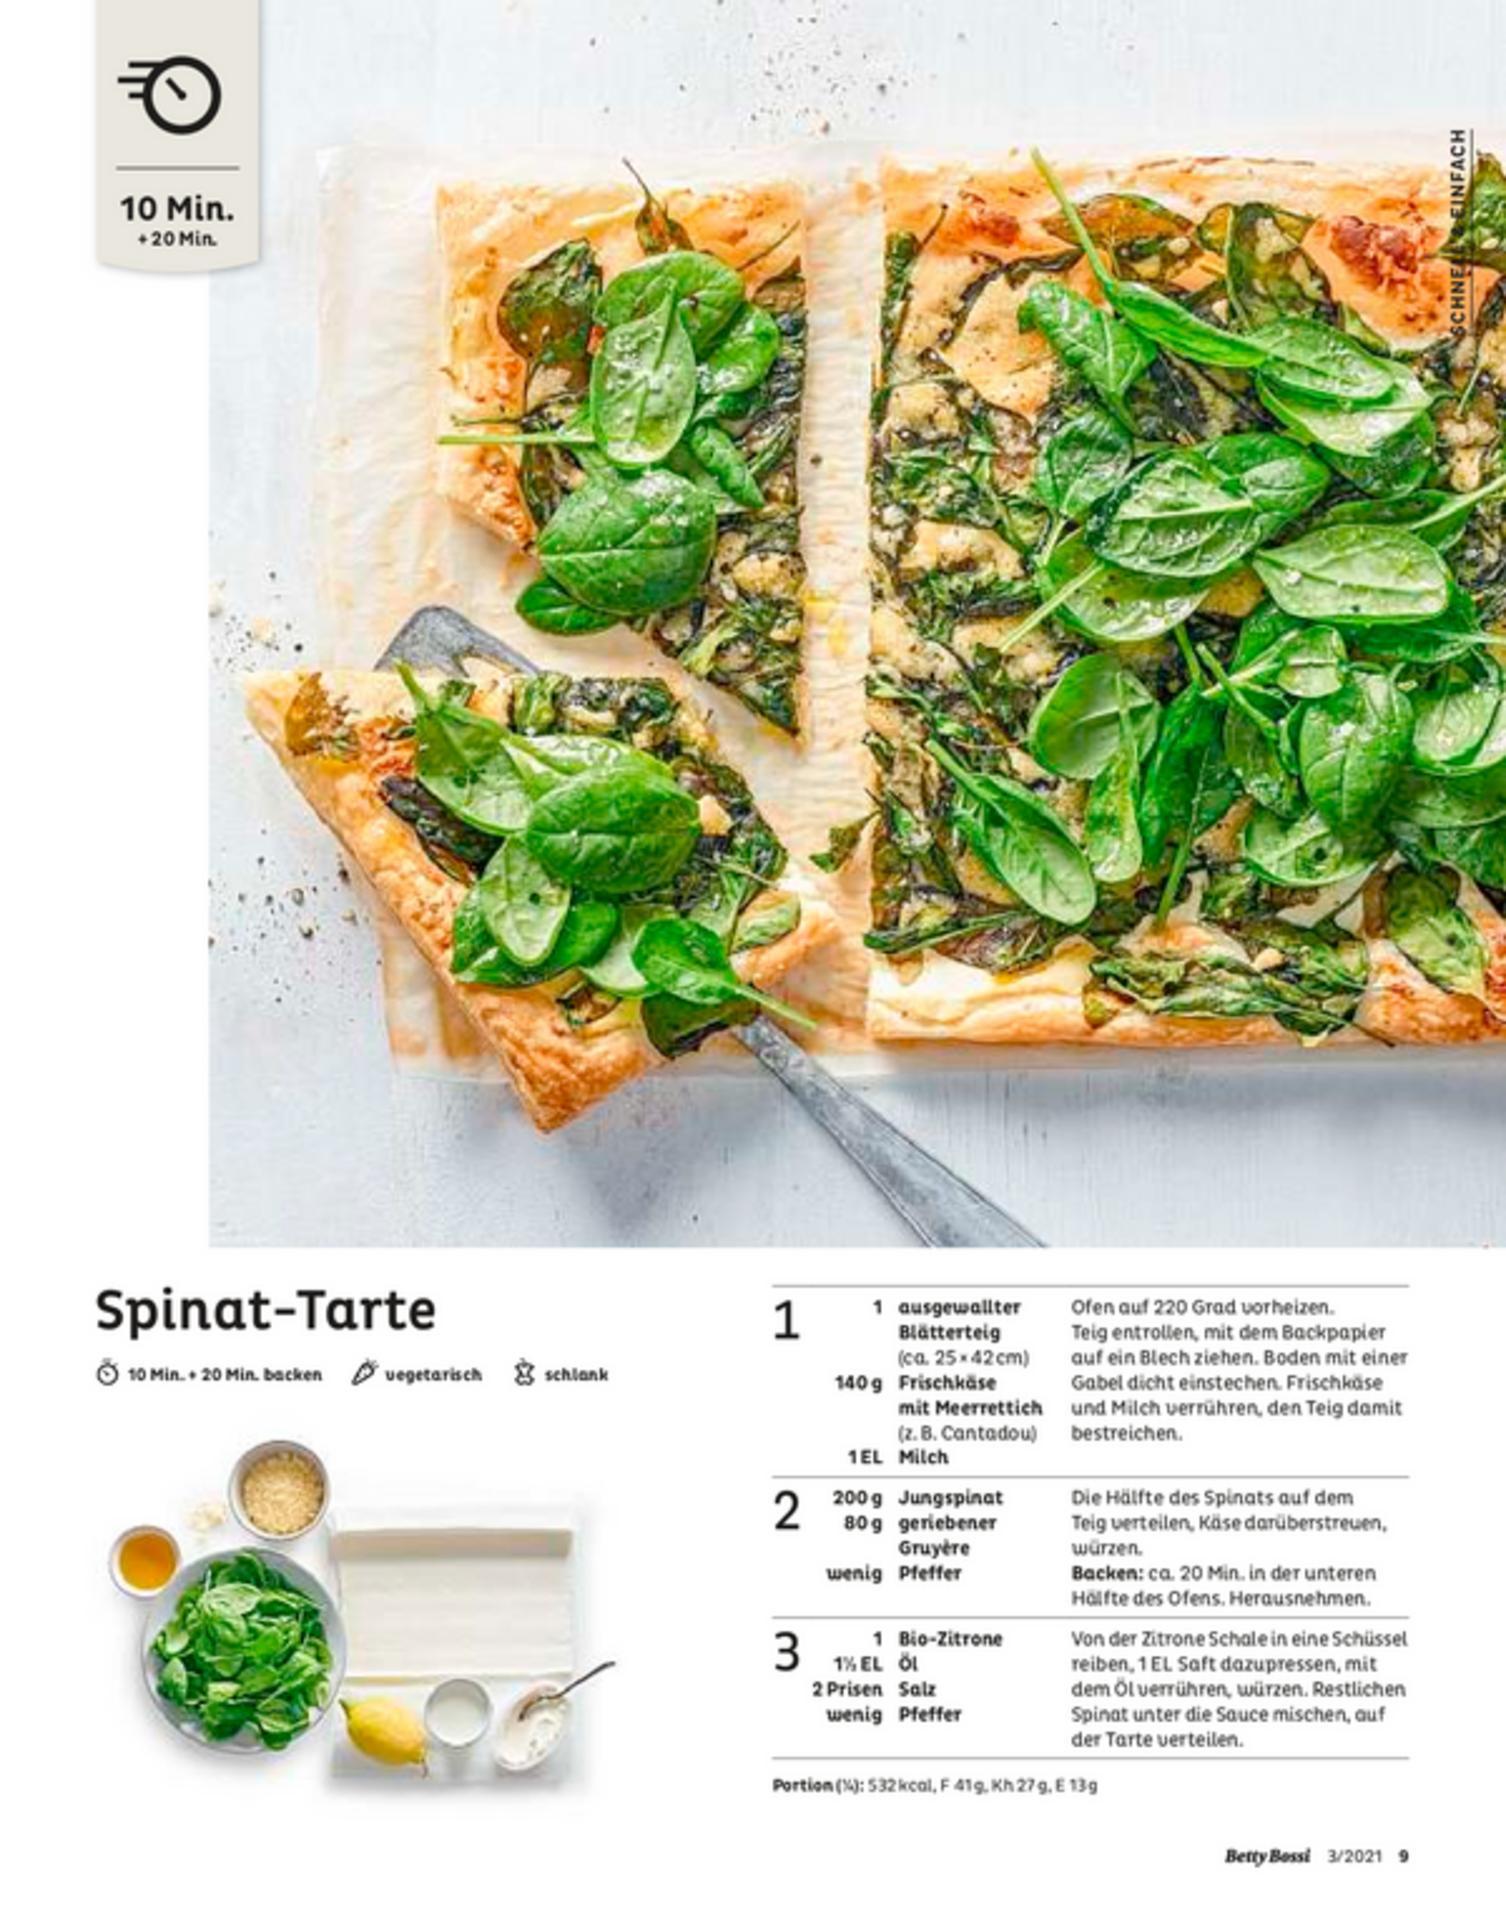 Spinat-Tarte